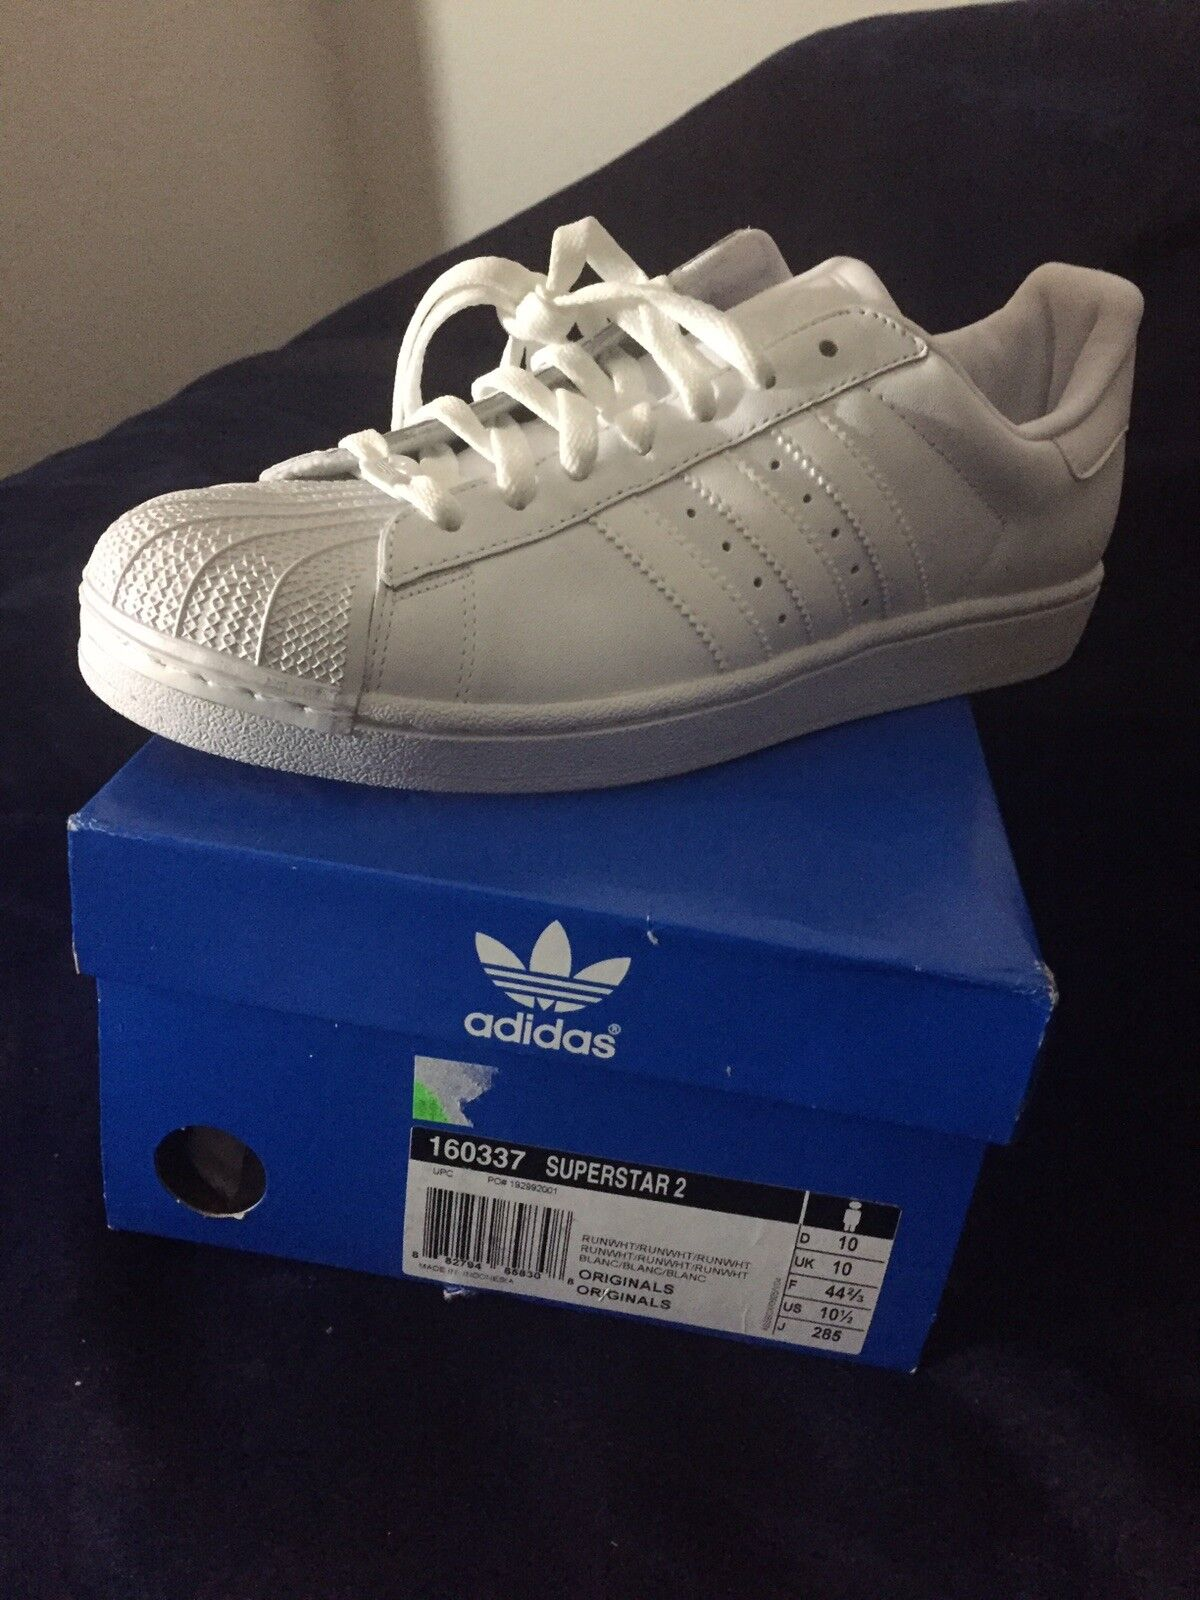 Adidas superstar 2 2 superstar white size 10.5 M Uomo Brand New a2cc49